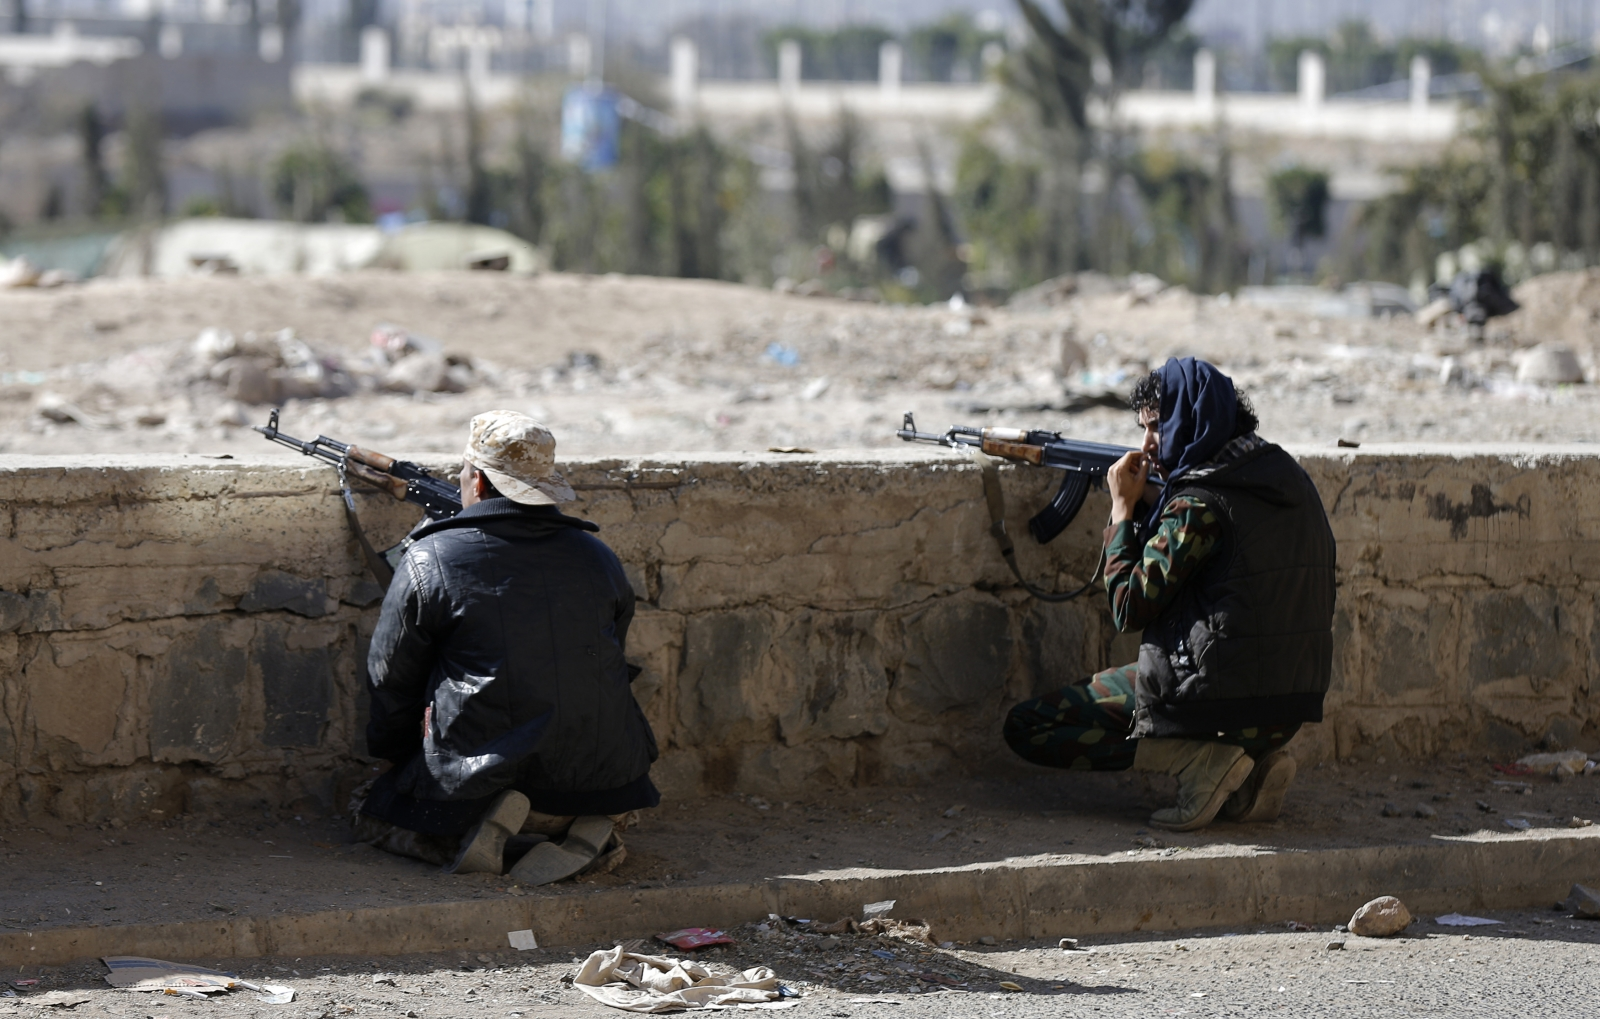 Yemen: President Hadi held 'captive' by Shiite Houthi rebels